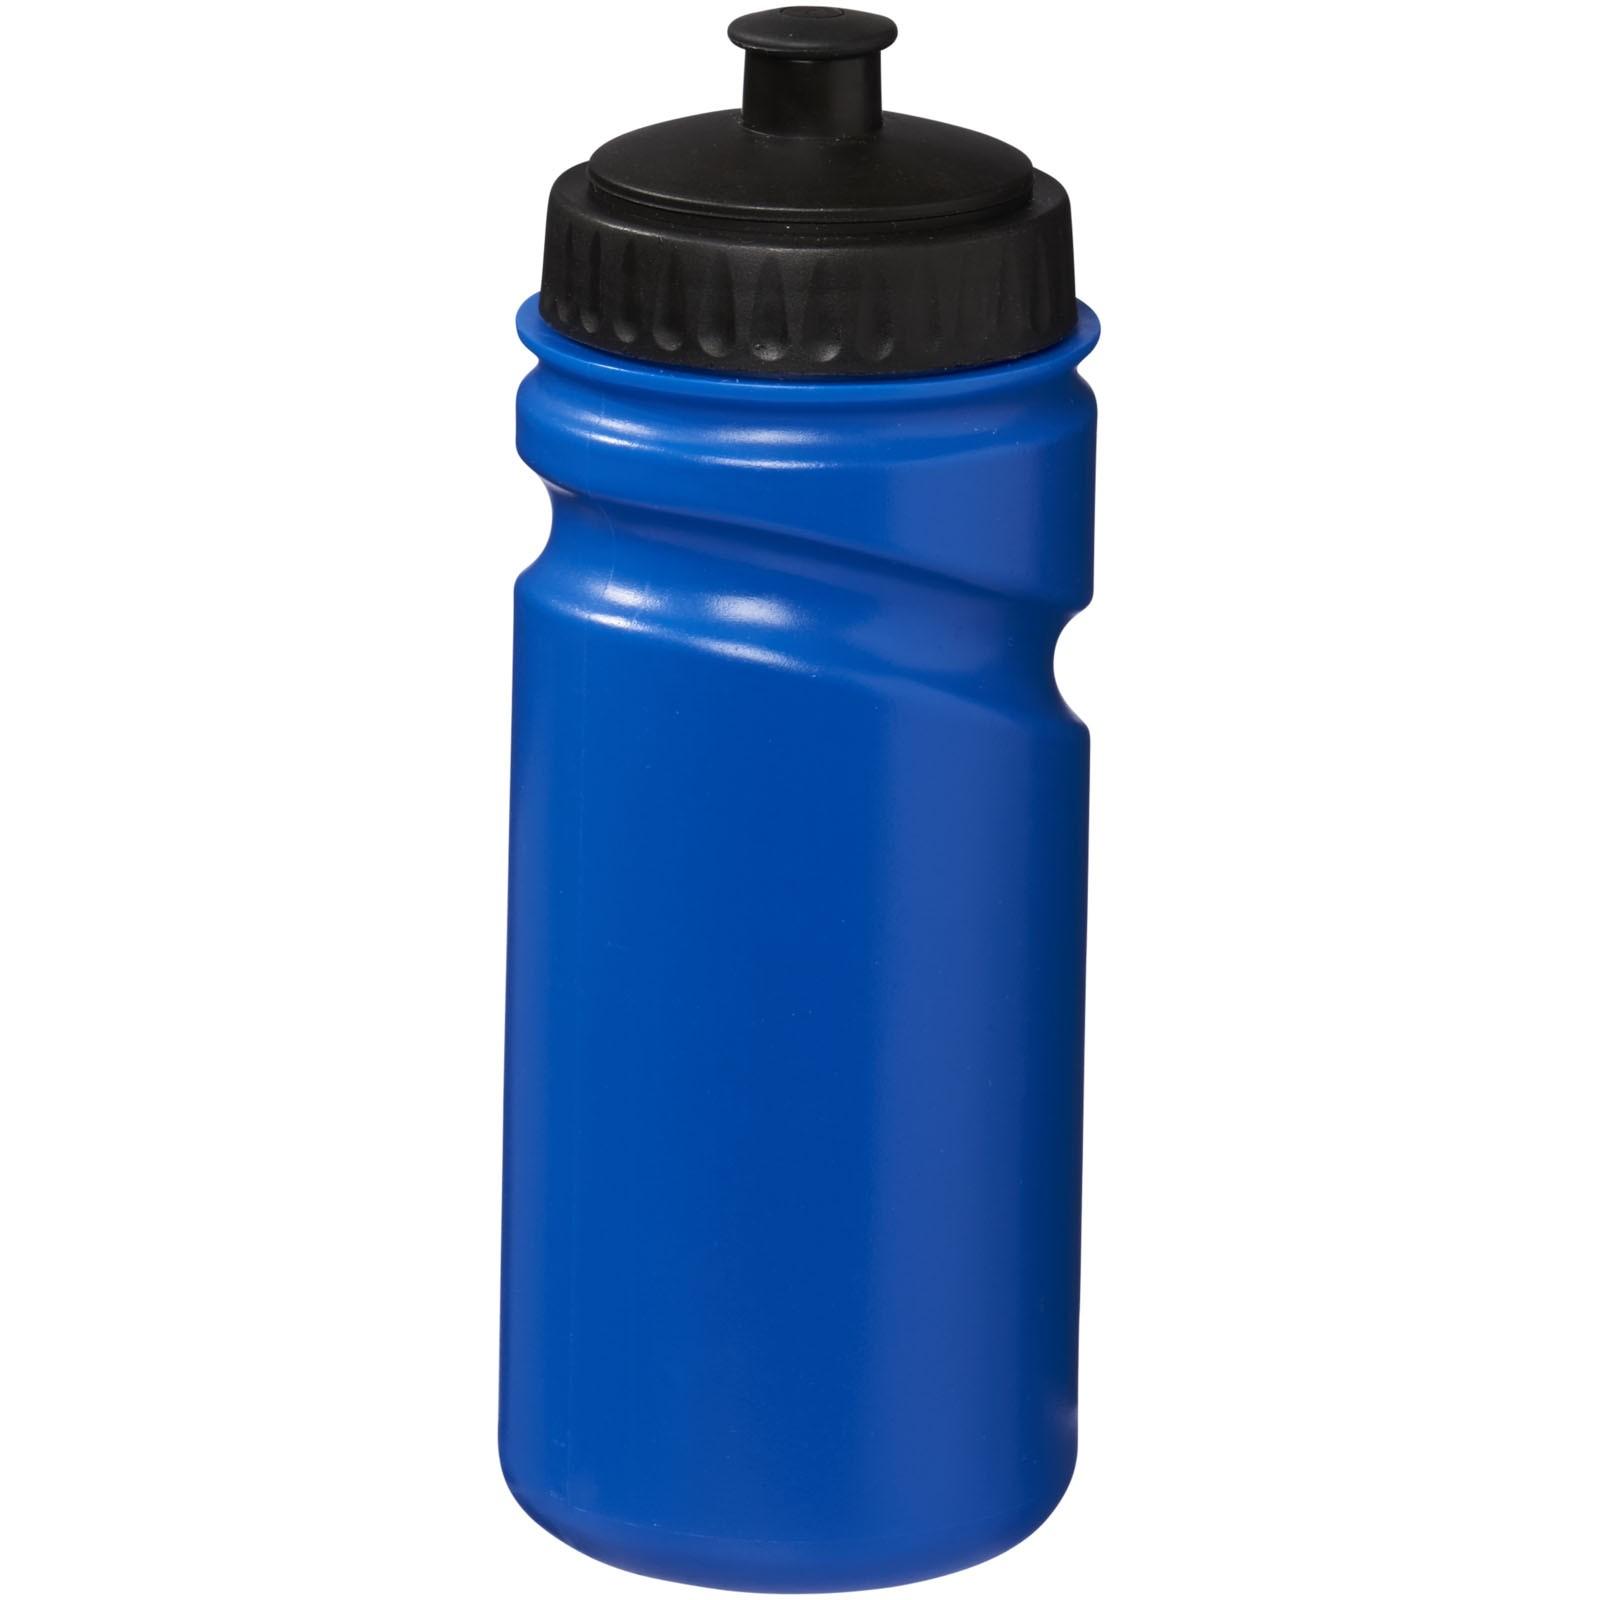 Sportovní láhev Easy Squeezy - barevná - Modrá / Černá